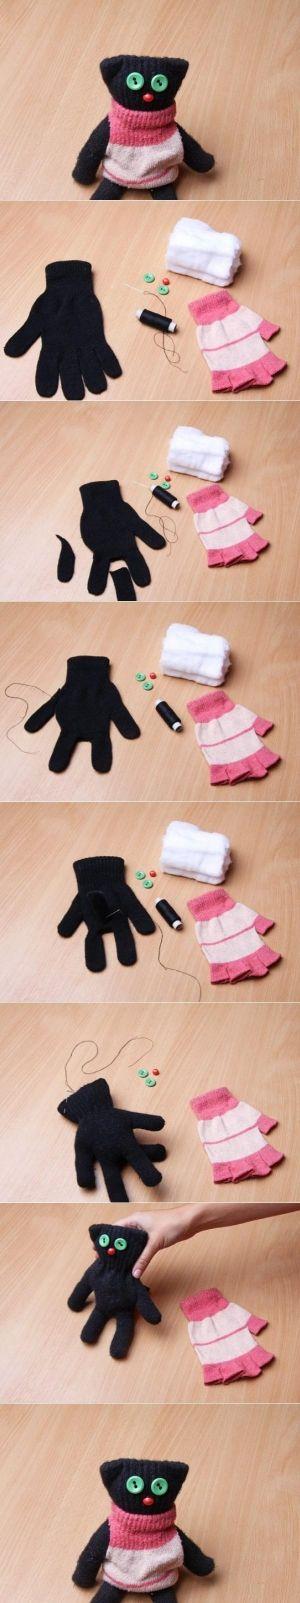 DIY Gloves Doll DIY Gloves Doll by diyforever